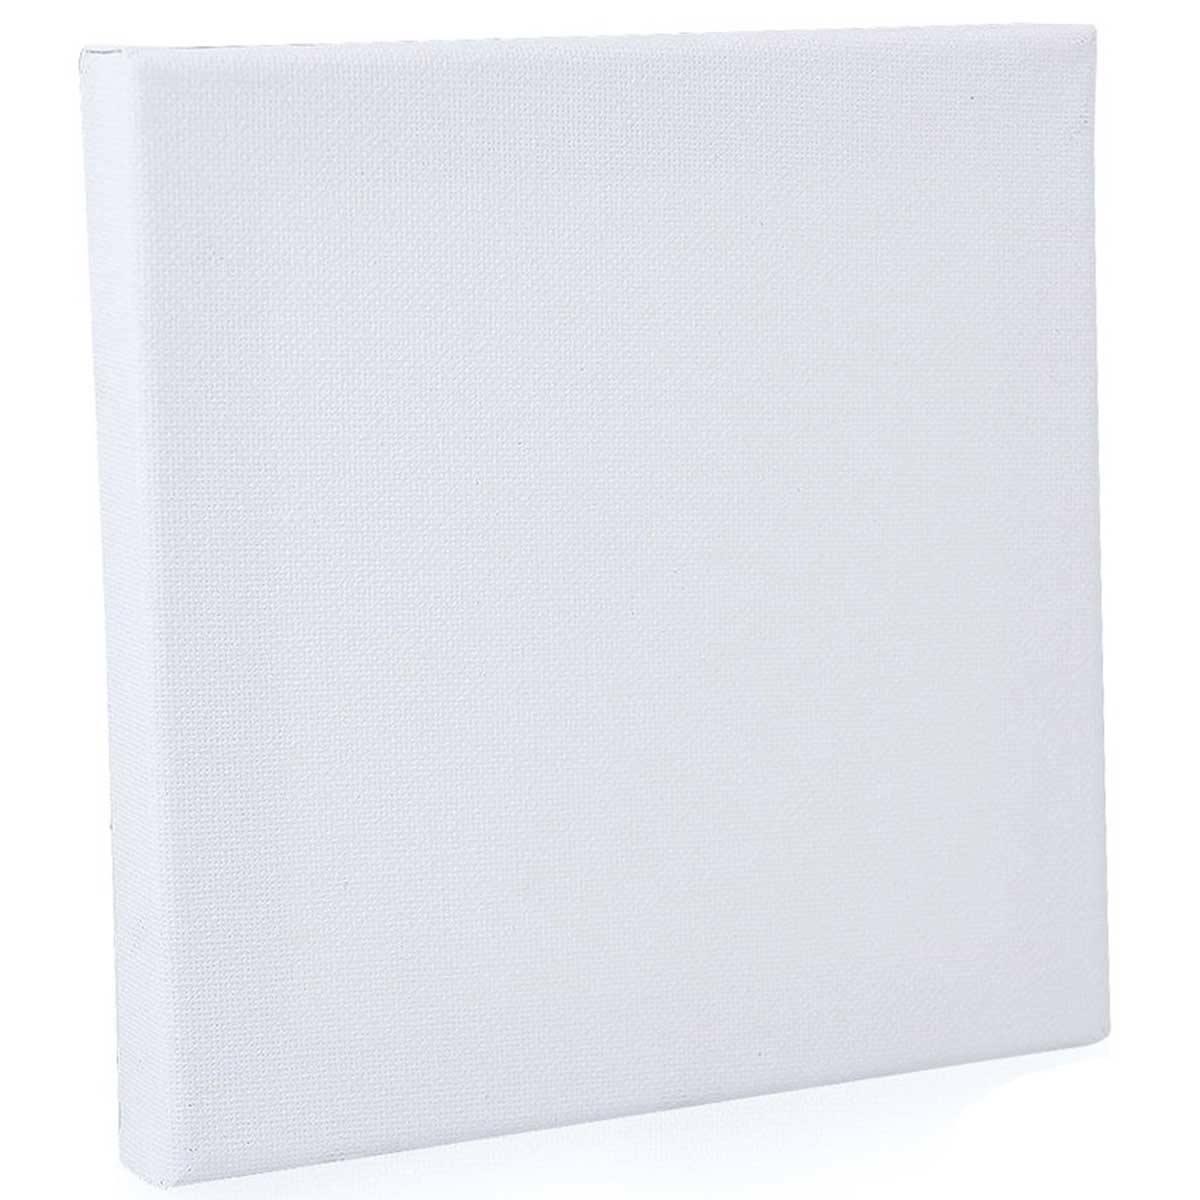 Mini Stretched Canvas Board (6X6 Inch)